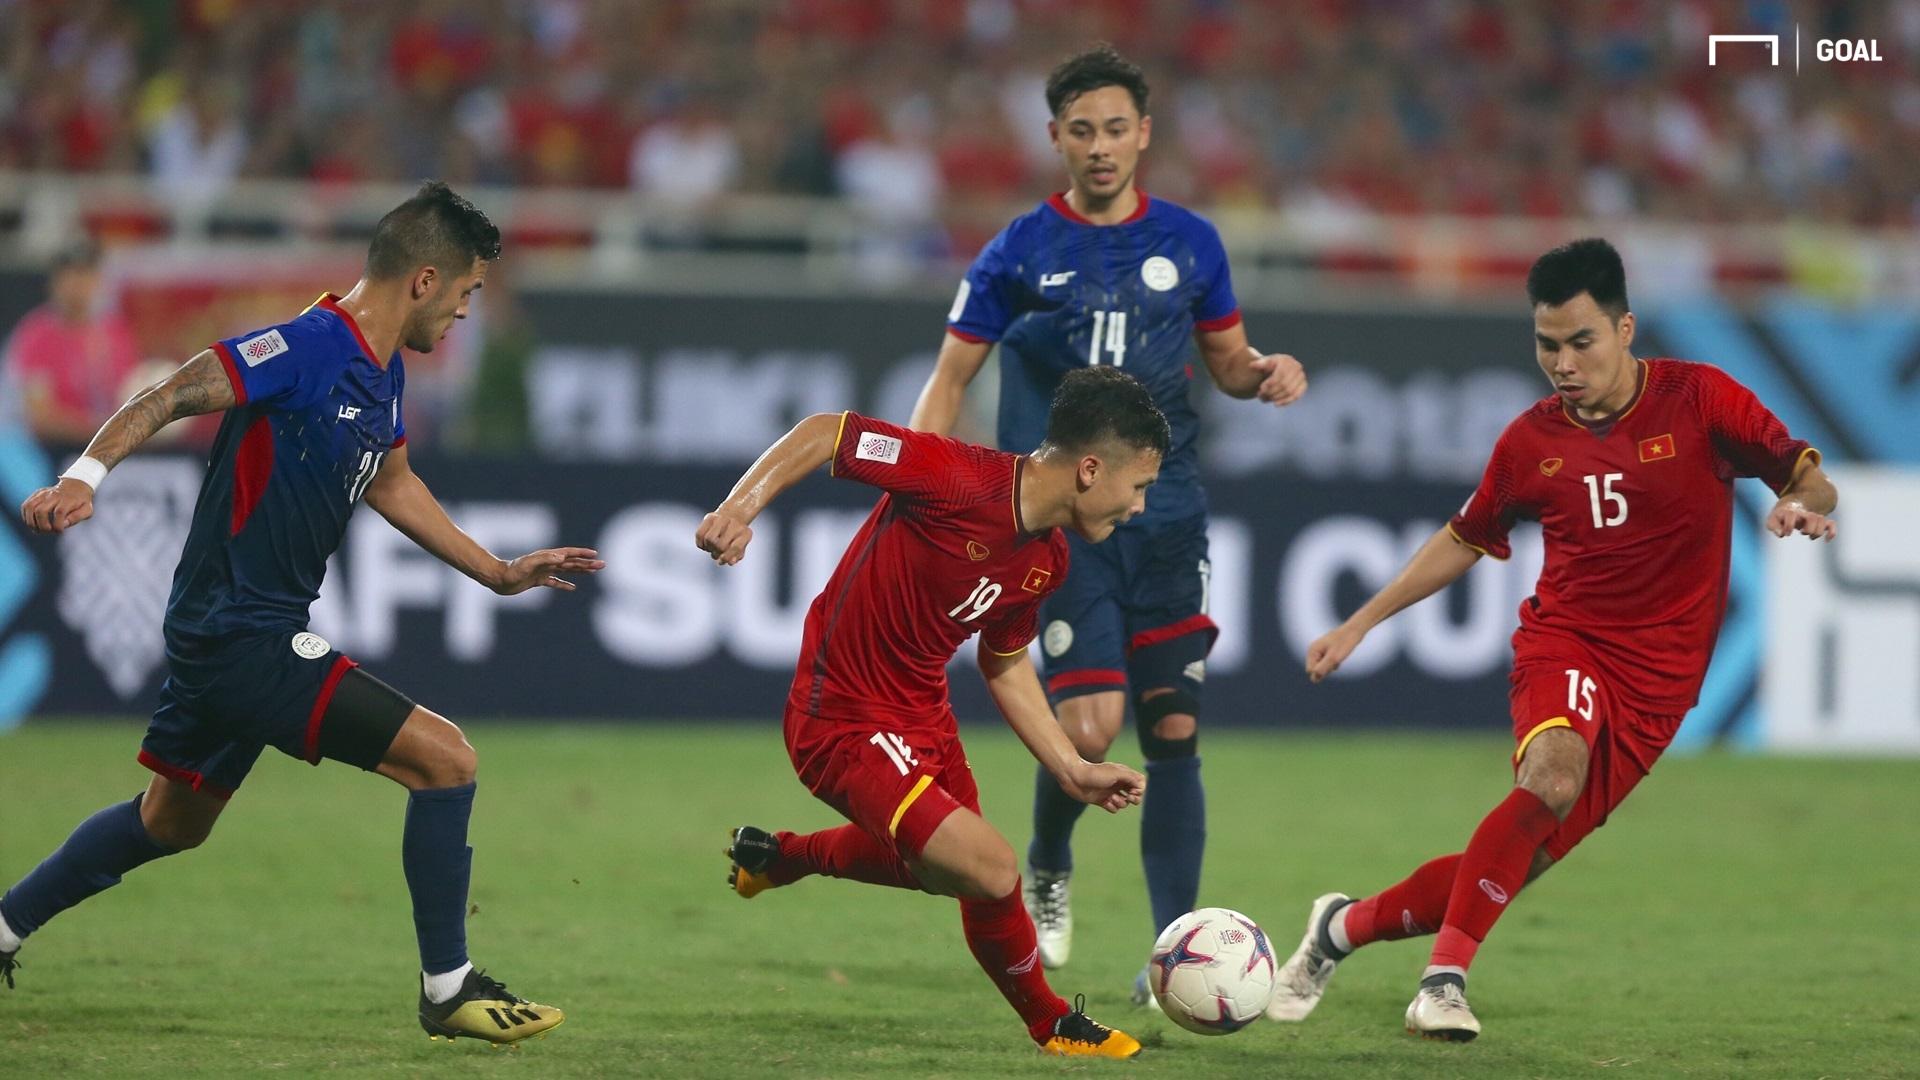 Nguyen Quang Hai Pham Duc Huy Vietnam AFF Cup 2018